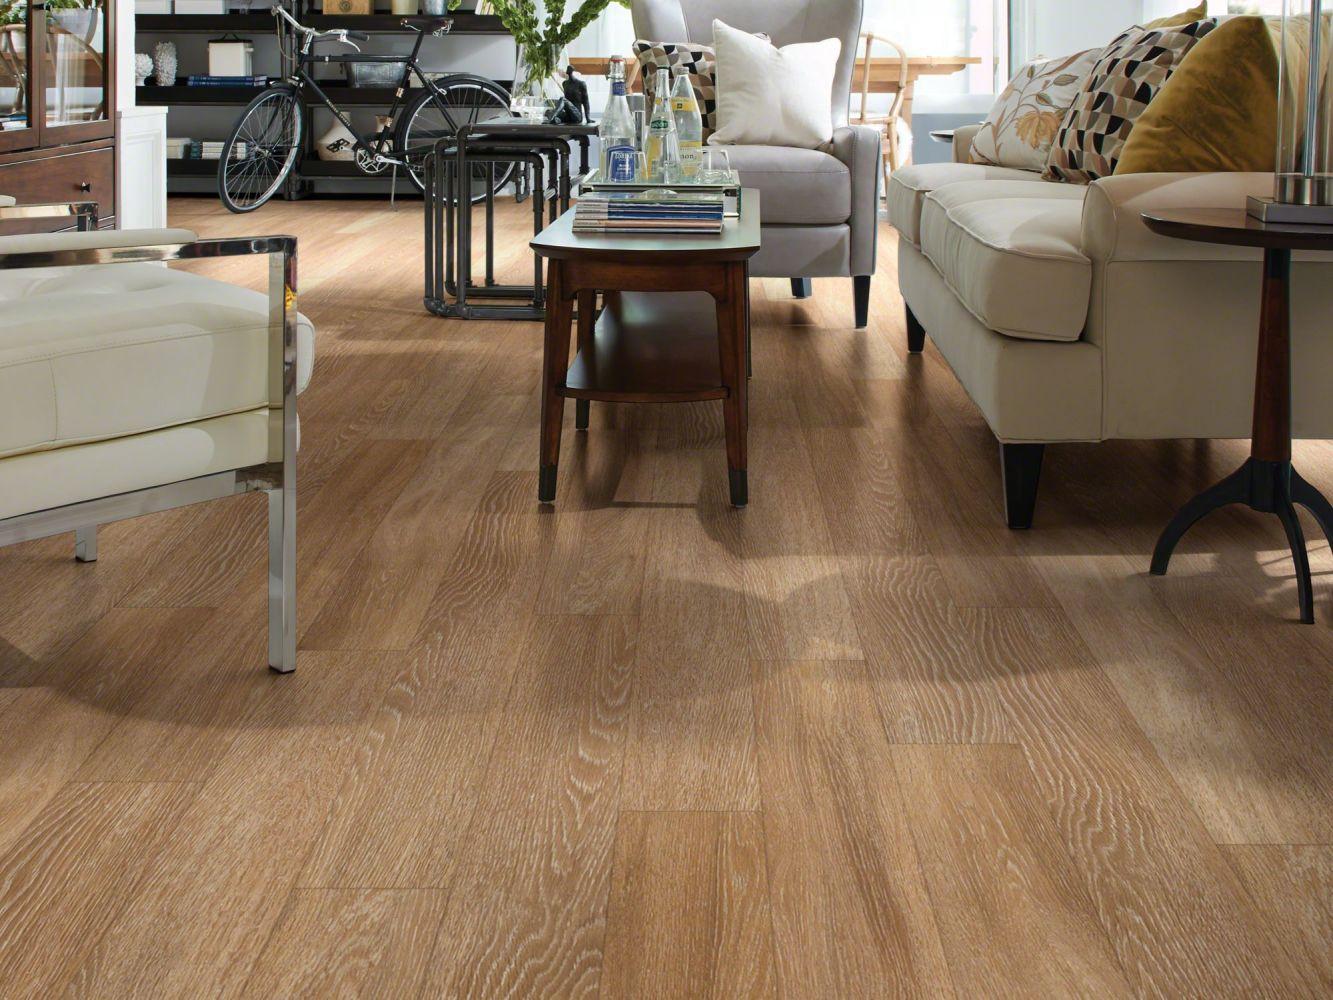 Shaw Floors Resilient Residential Premio Plus Plank Duomo 00228_2490V